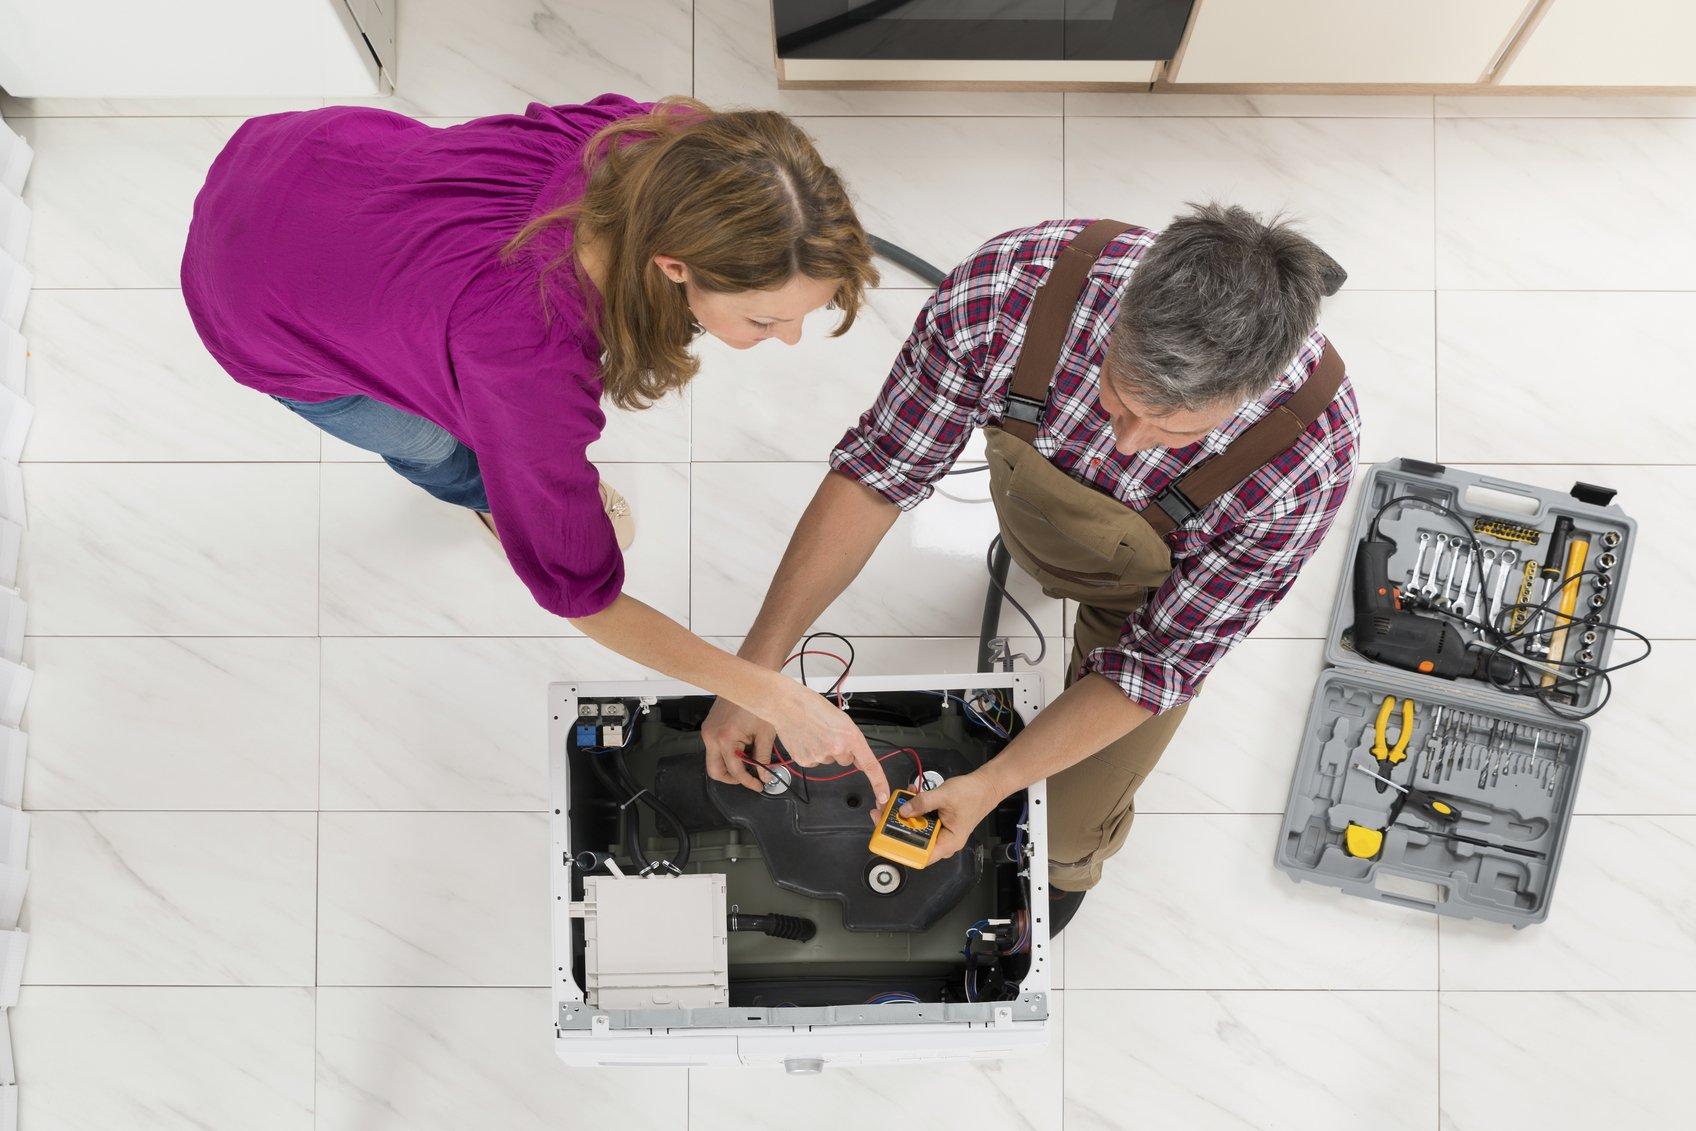 Washer Appliance Repair San Antonio, TX